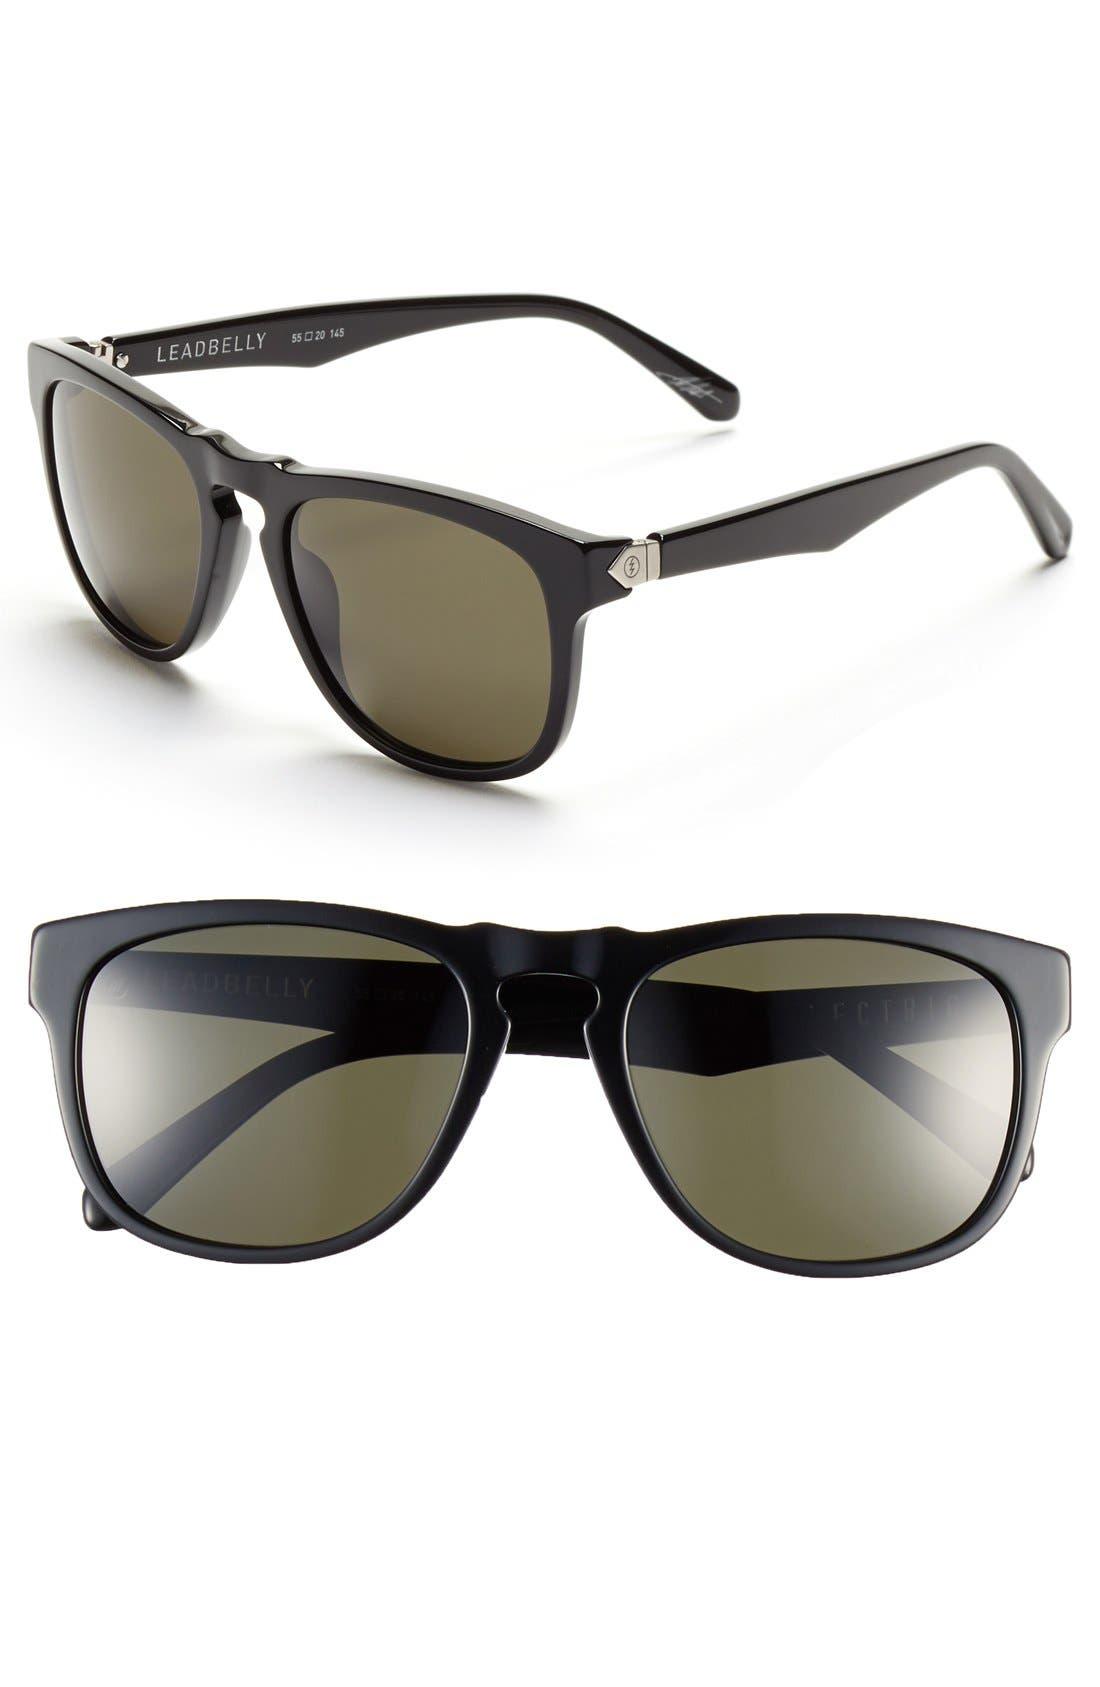 'Leadbelly' 55mm Sunglasses,                             Main thumbnail 1, color,                             001